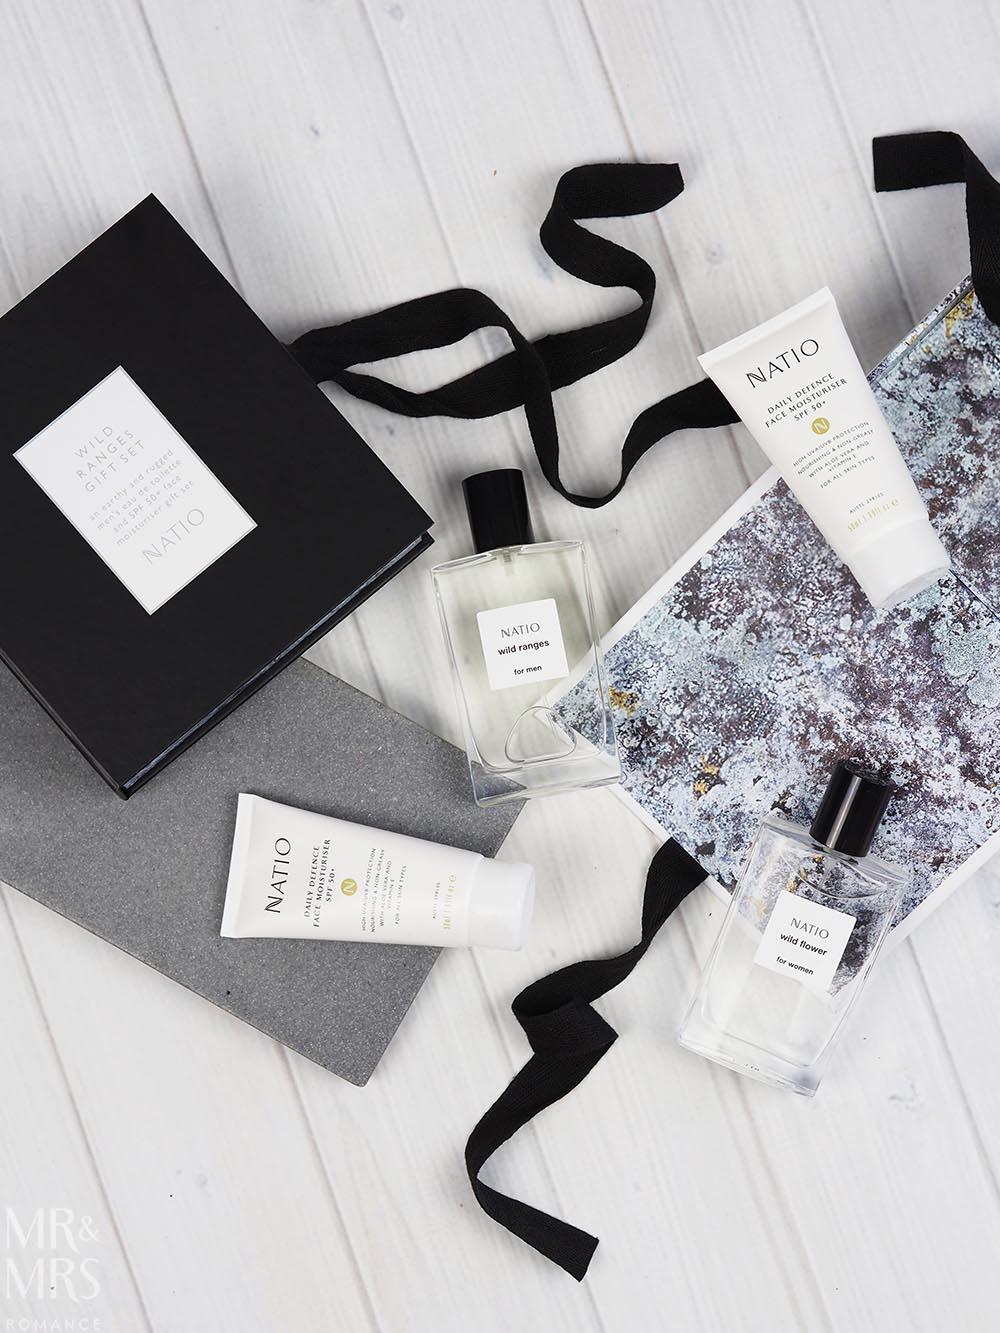 Natio - Cosmetics gift ideas